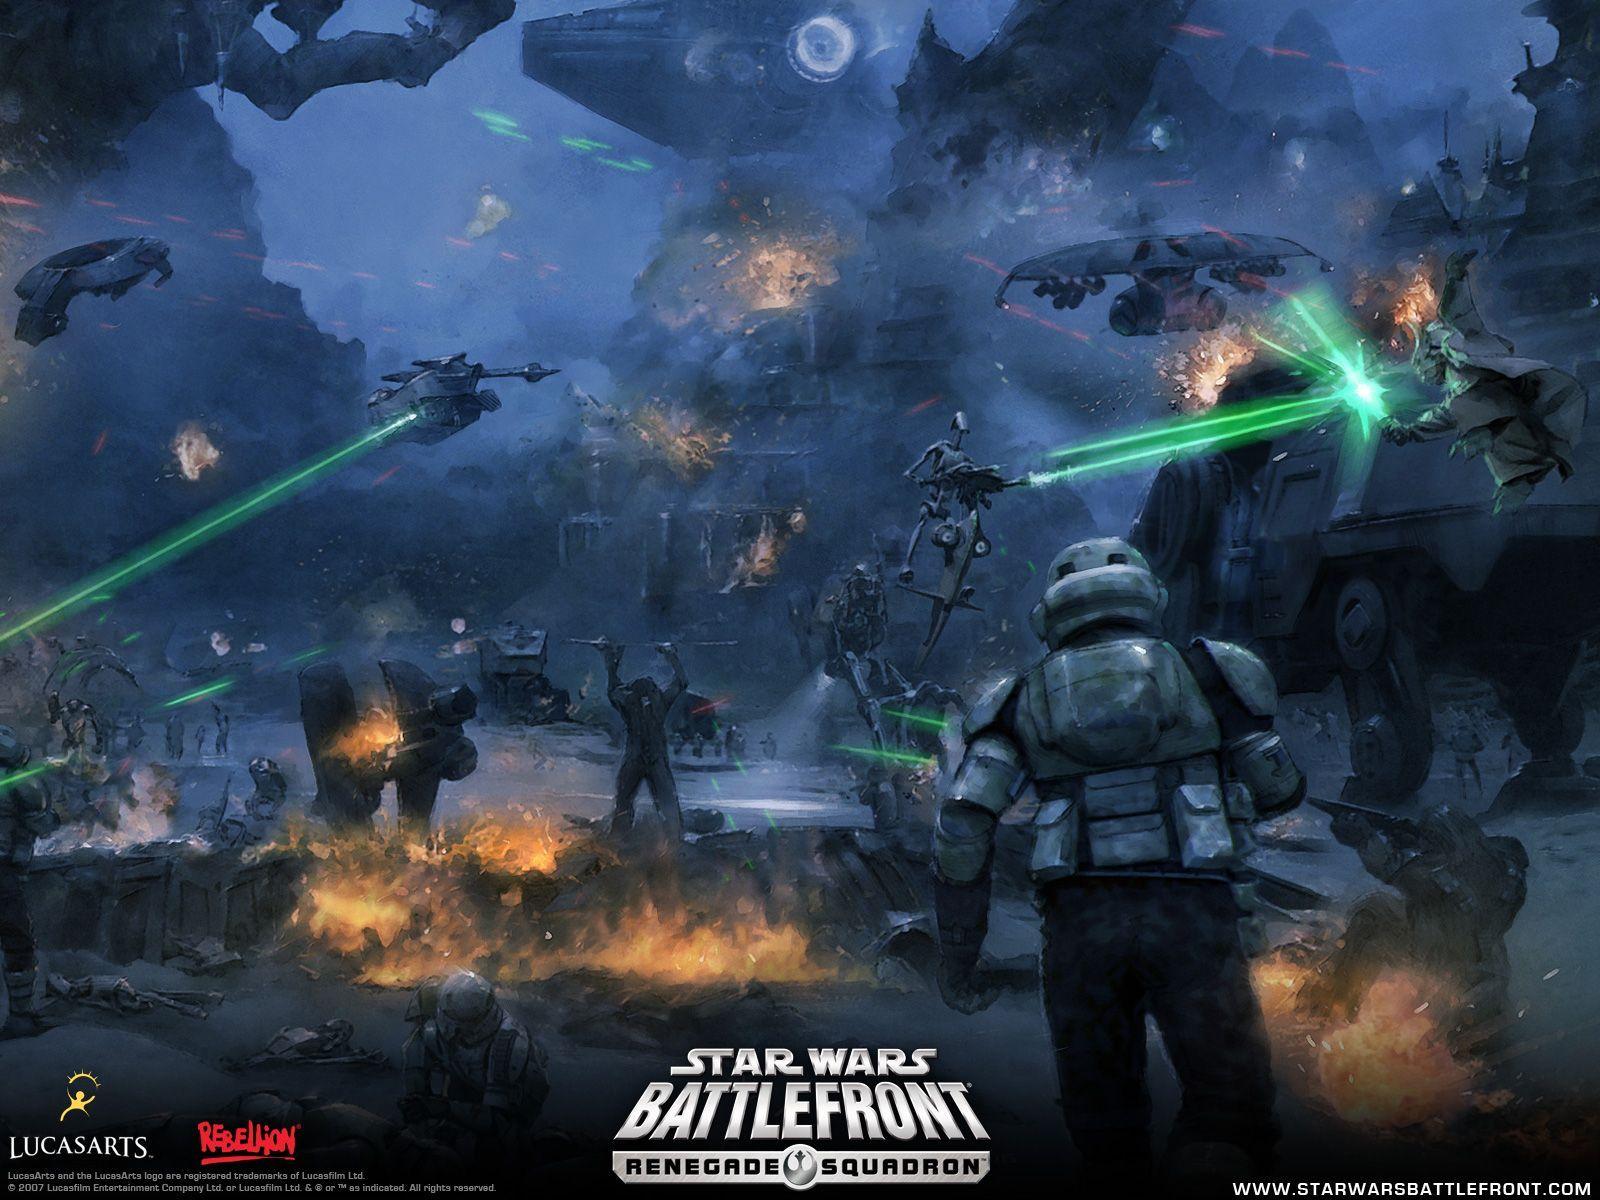 Star Wars Battlefront Renegade Squadron 4 Tvi8aus4wm 1600 1200